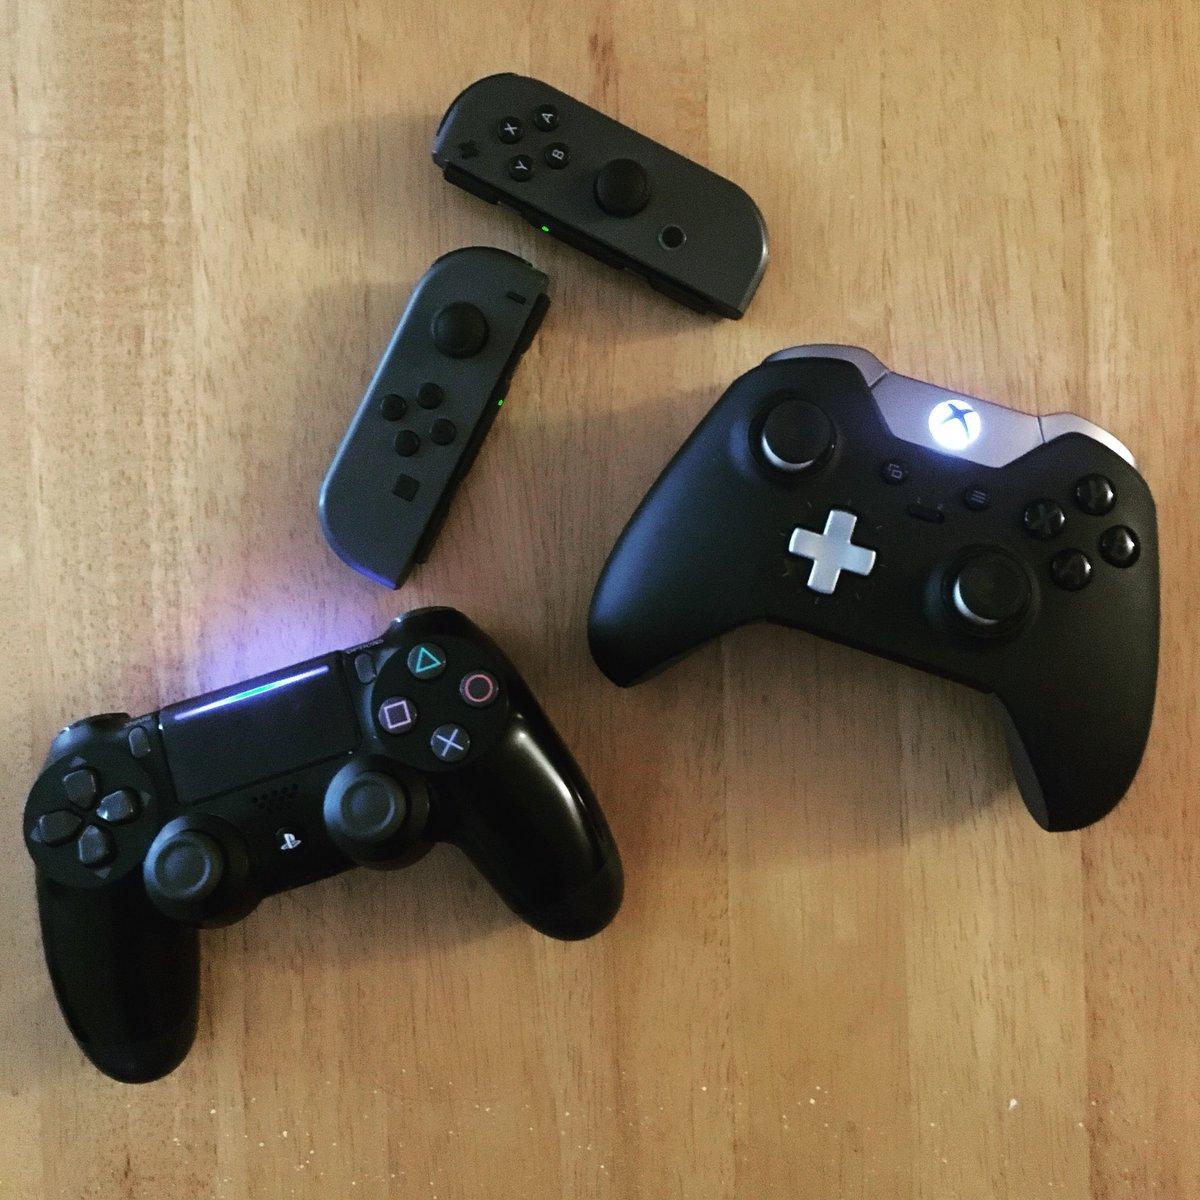 Game your way.  #PS4 #XboxOne #NintendoSwitch #Sony #Microsoft #Nintendo #Gaming<br>http://pic.twitter.com/Yg6ZqahMAI